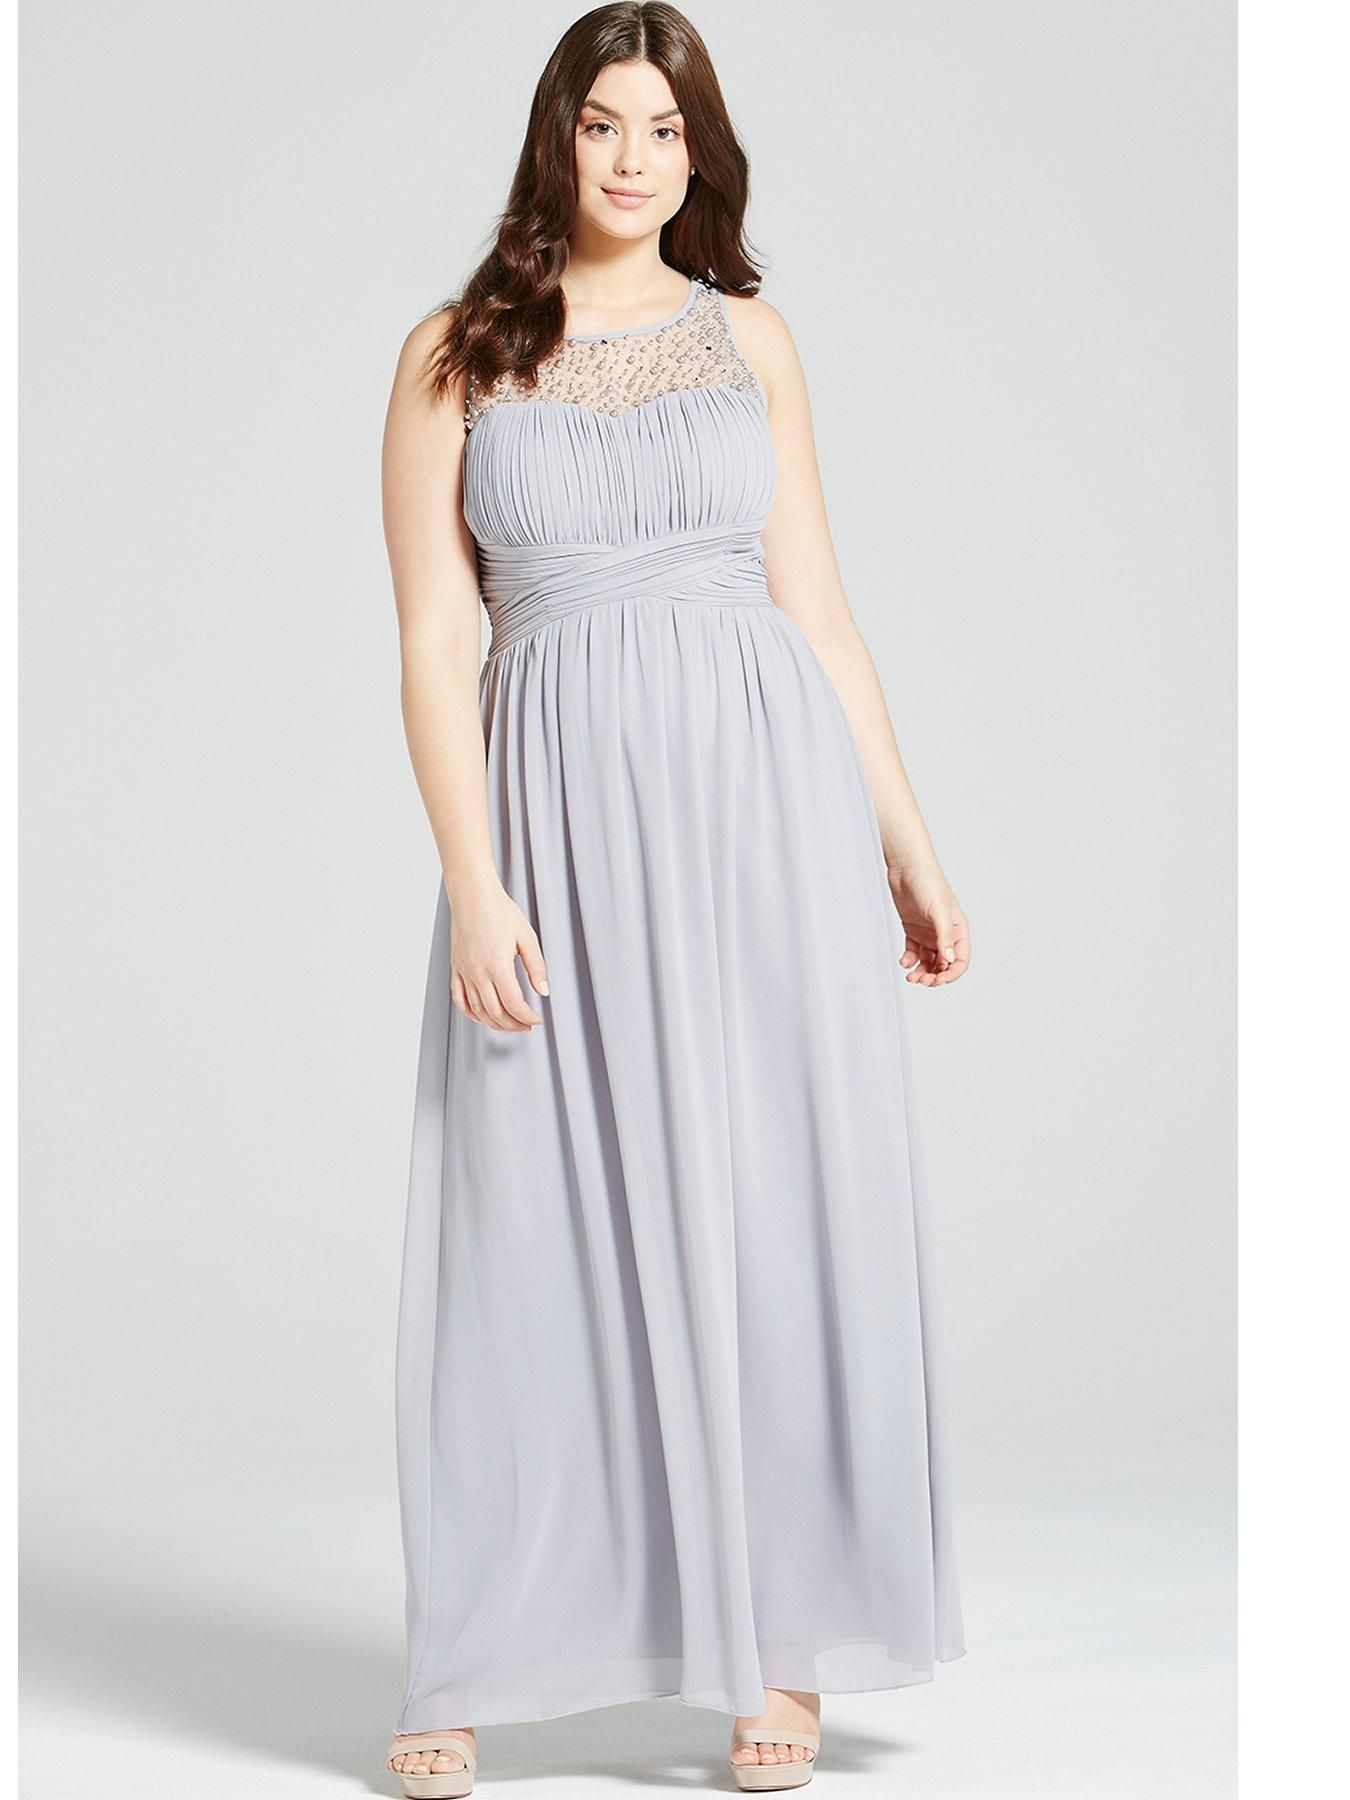 Maxi dress for wedding  Embellished Maxi Dress  Grey  Weddings